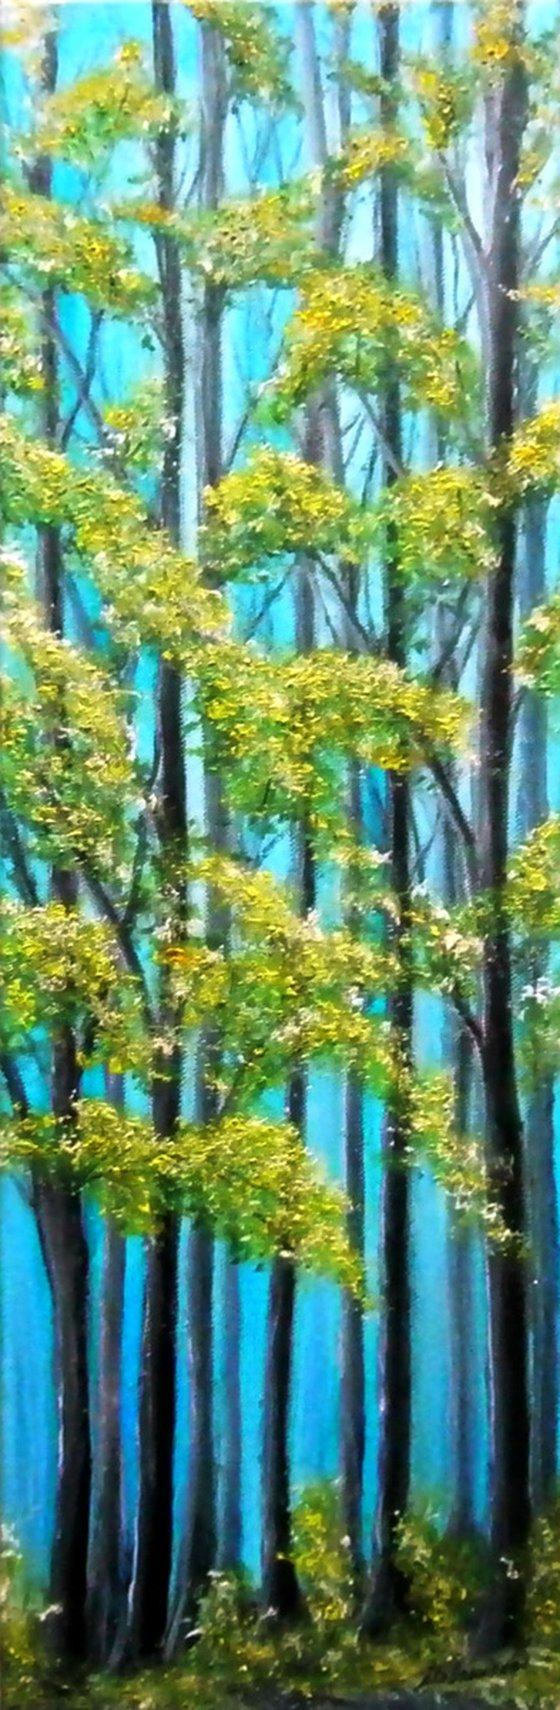 Common Plain Trees ..